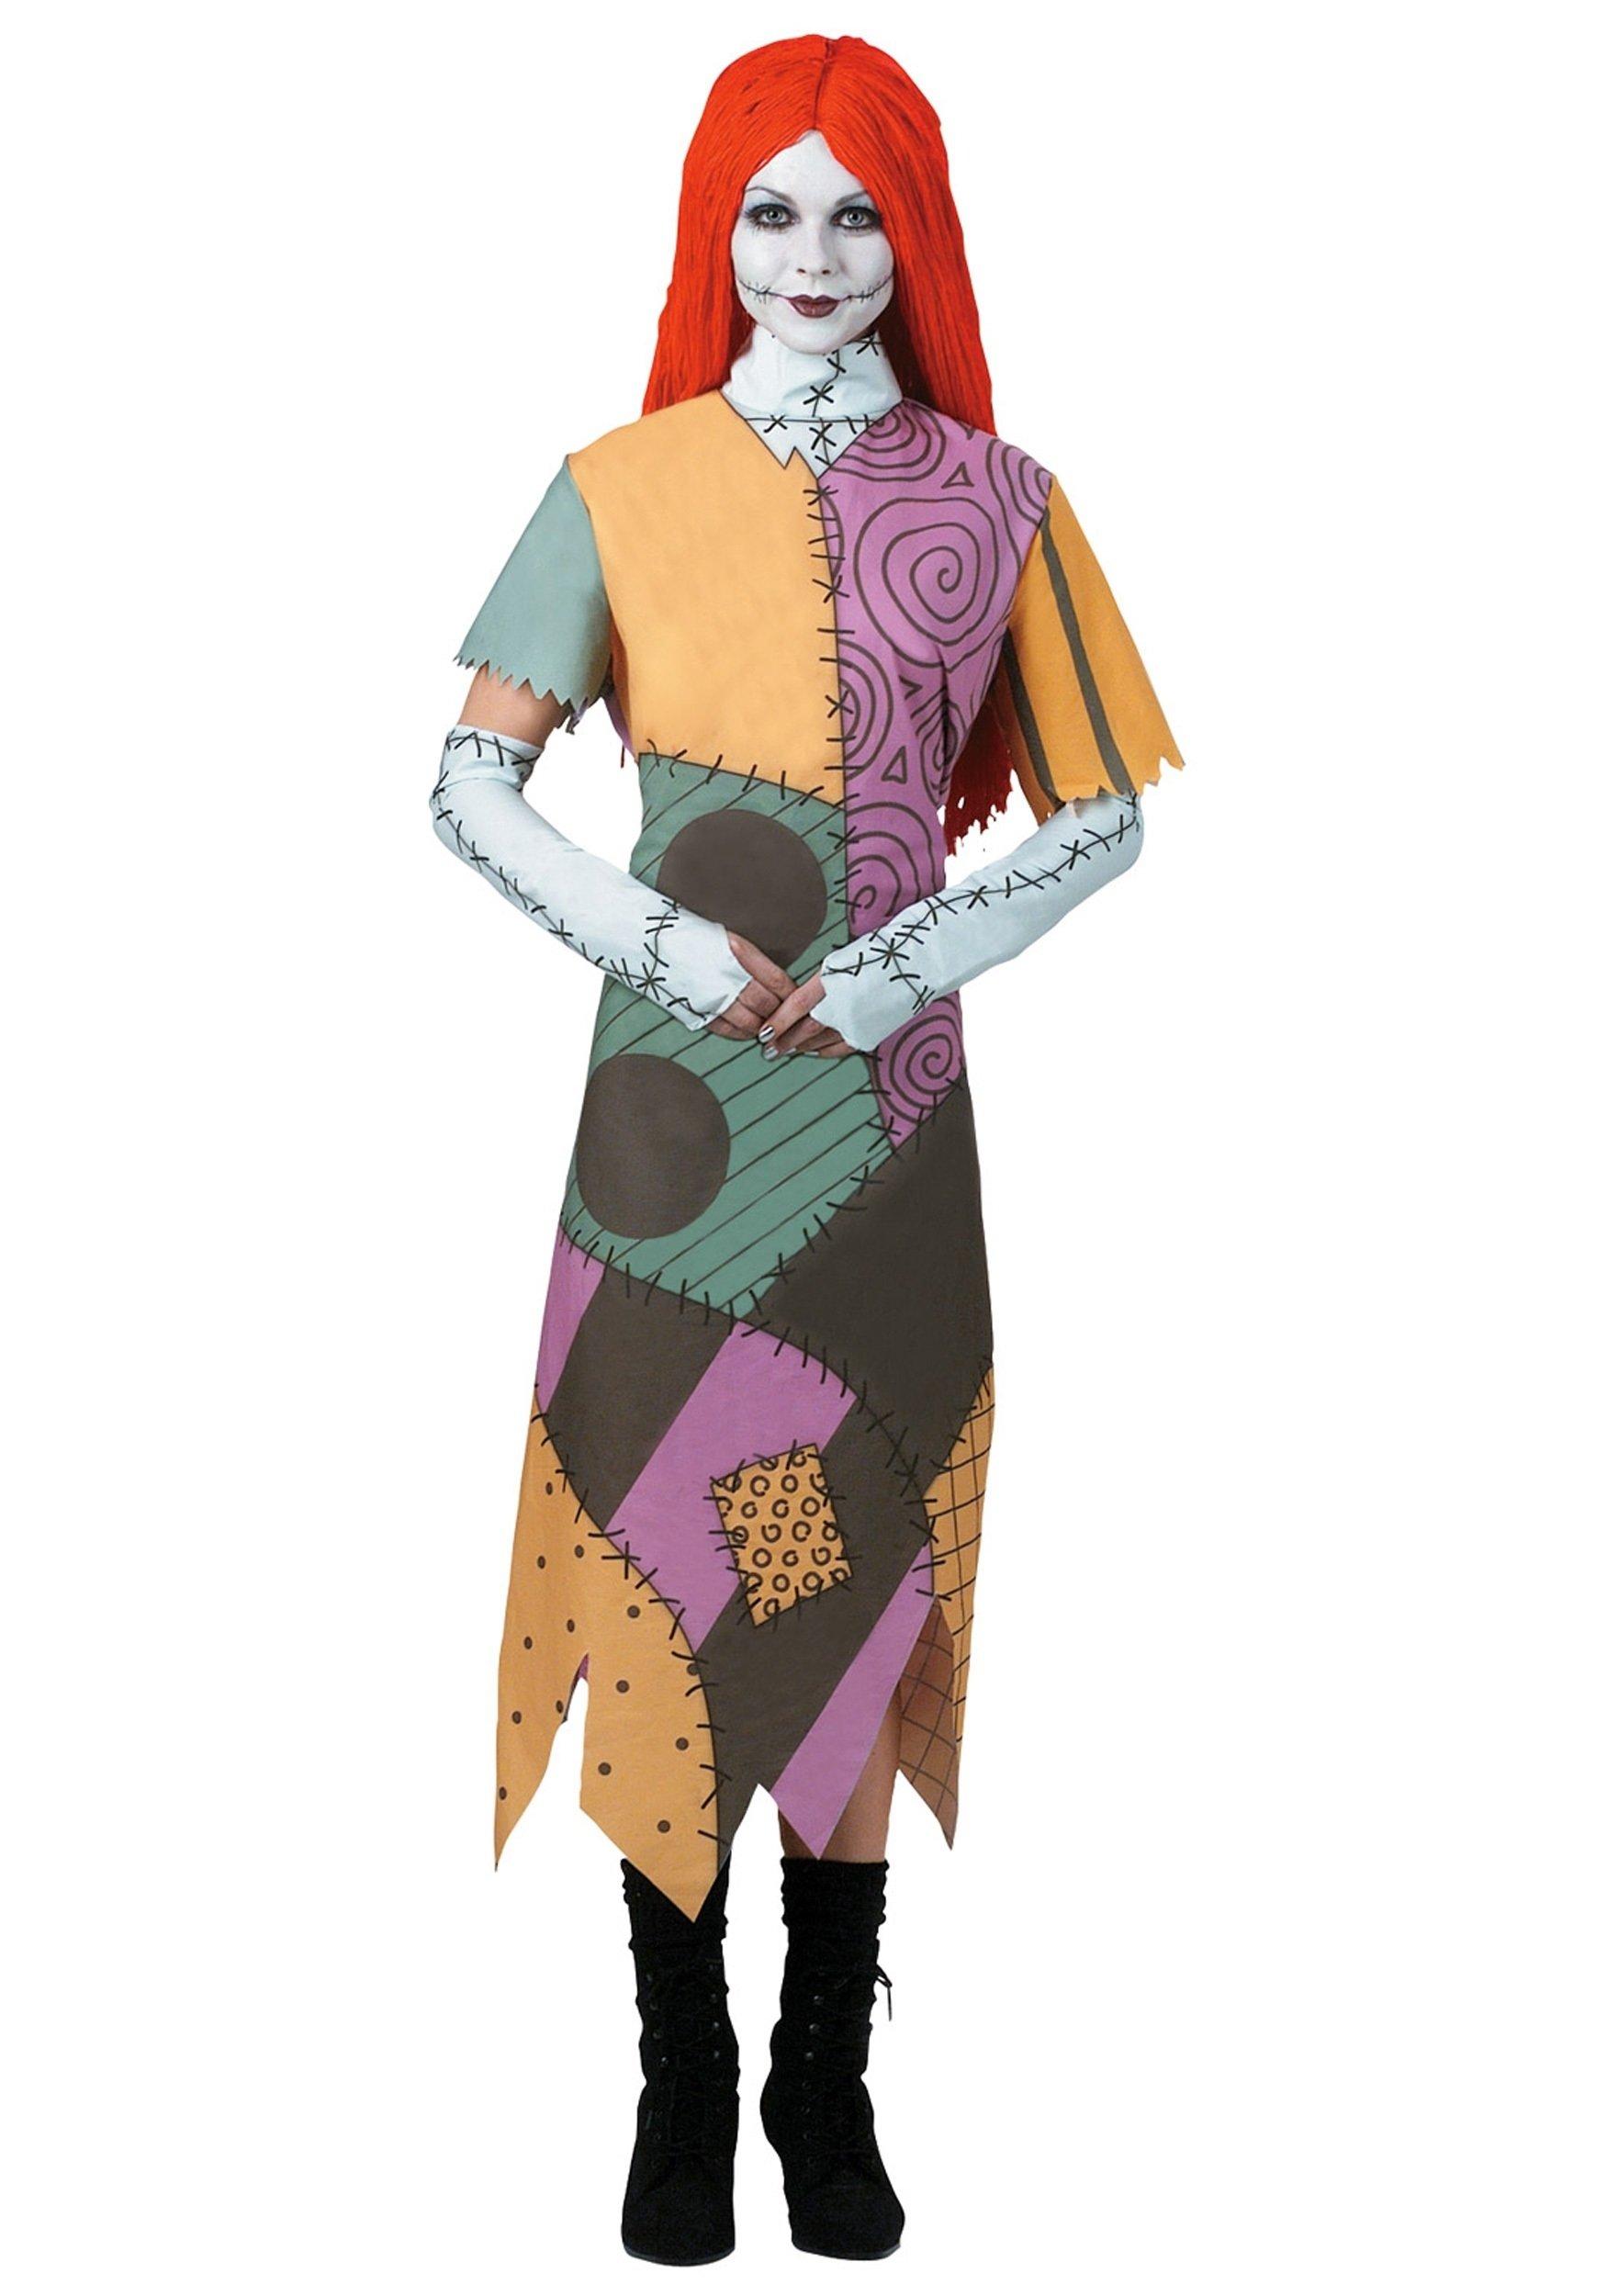 10 Elegant Funny Halloween Costume Ideas Women adult sally costume 2020